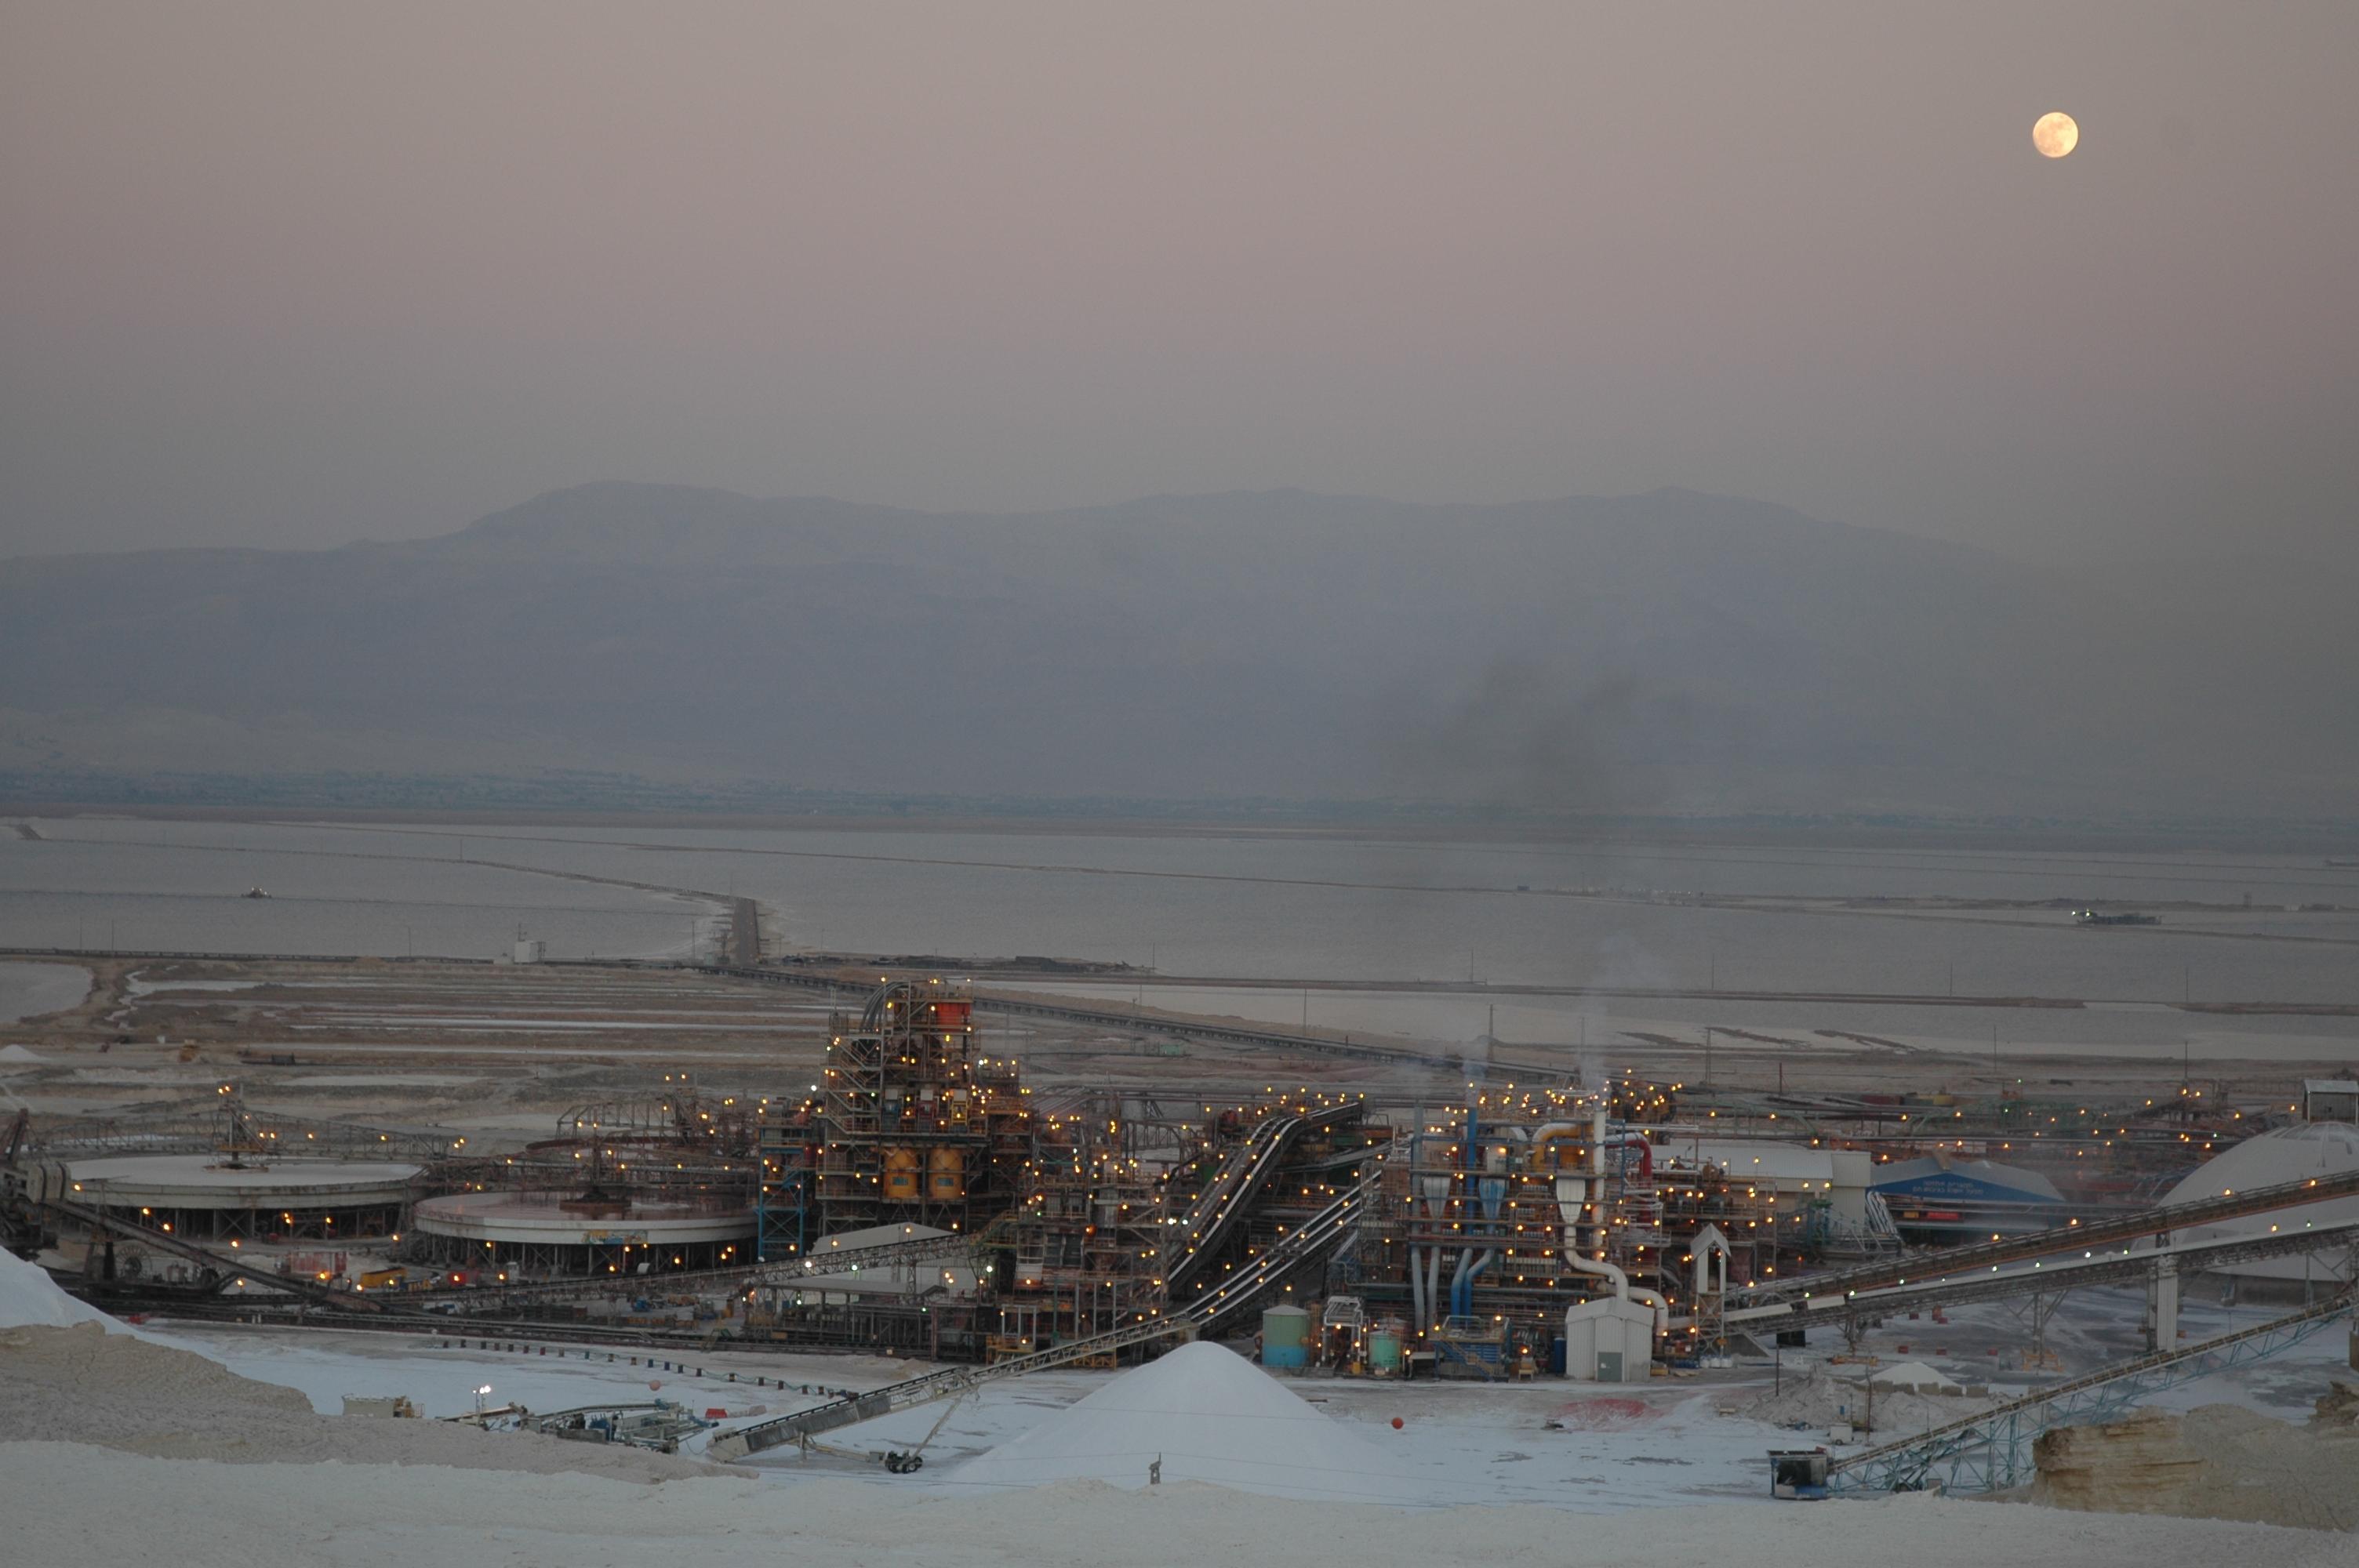 Full moon over Dead Sea Works